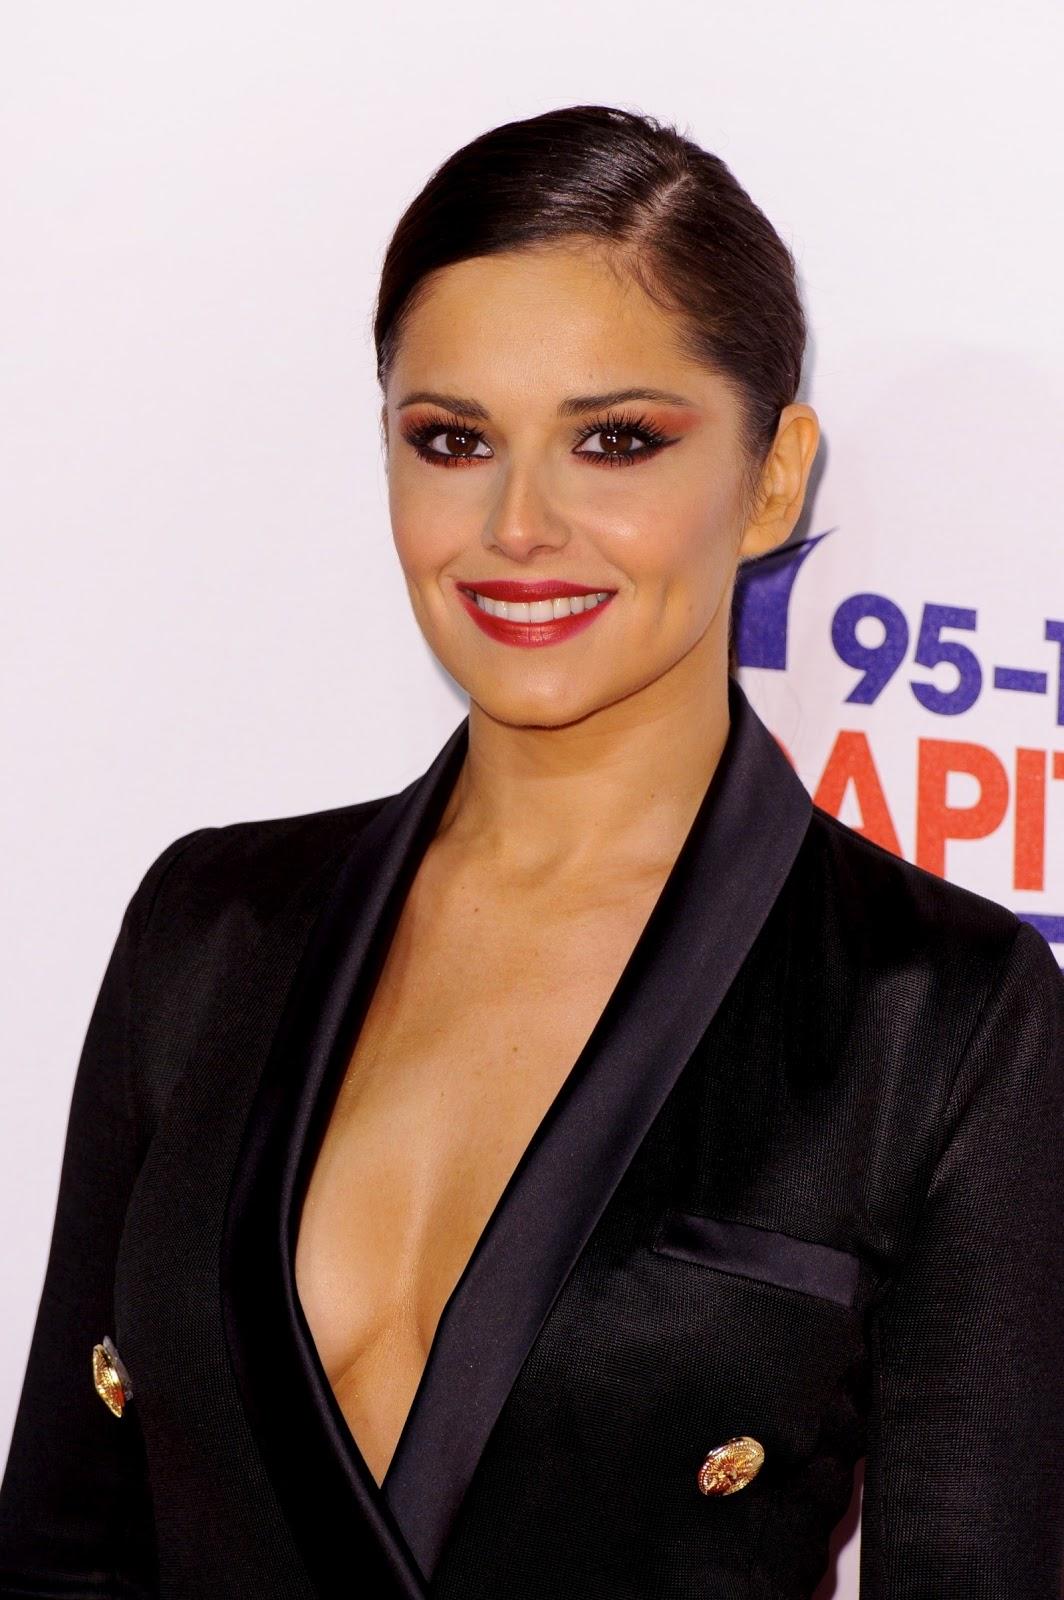 http://3.bp.blogspot.com/-8KEktsTCxSk/UMWEzyVUCAI/AAAAAAABOBE/0t-7iVgTa98/s1600/Cheryl-Cole-hot+(8).jpg